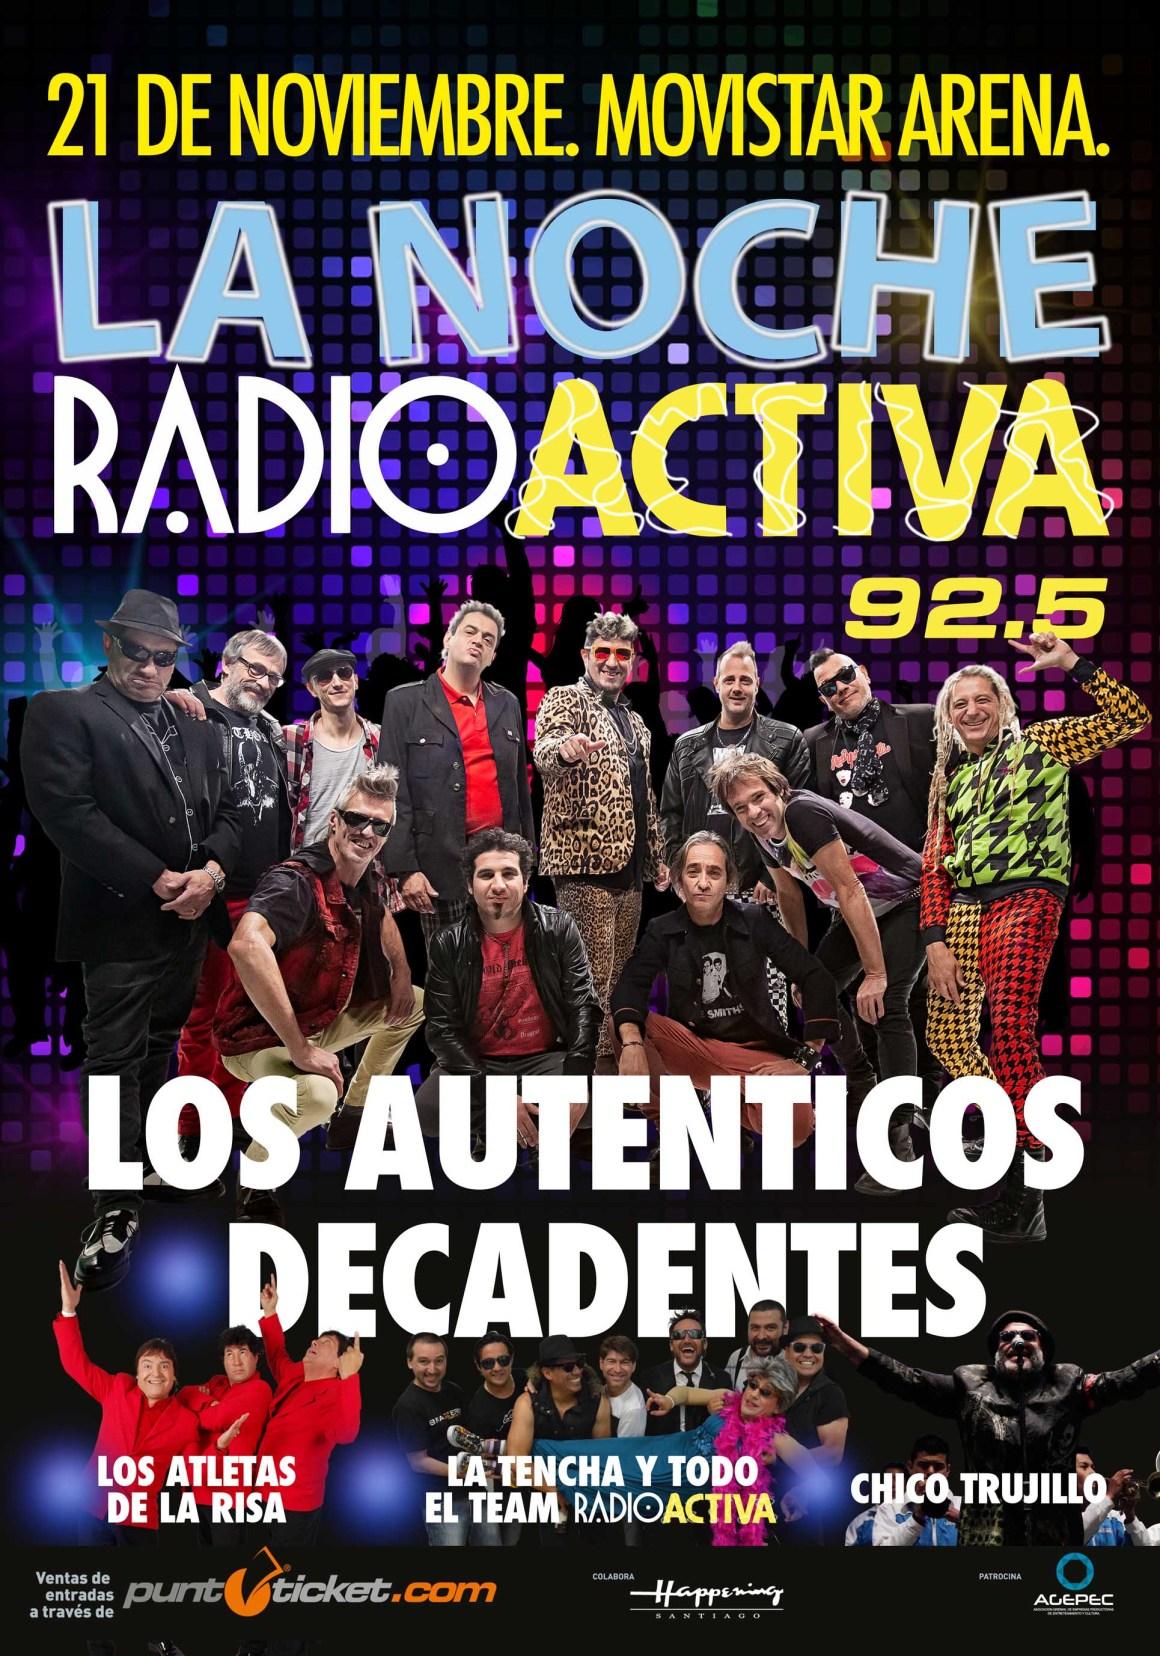 AficheNocheRadioActiva